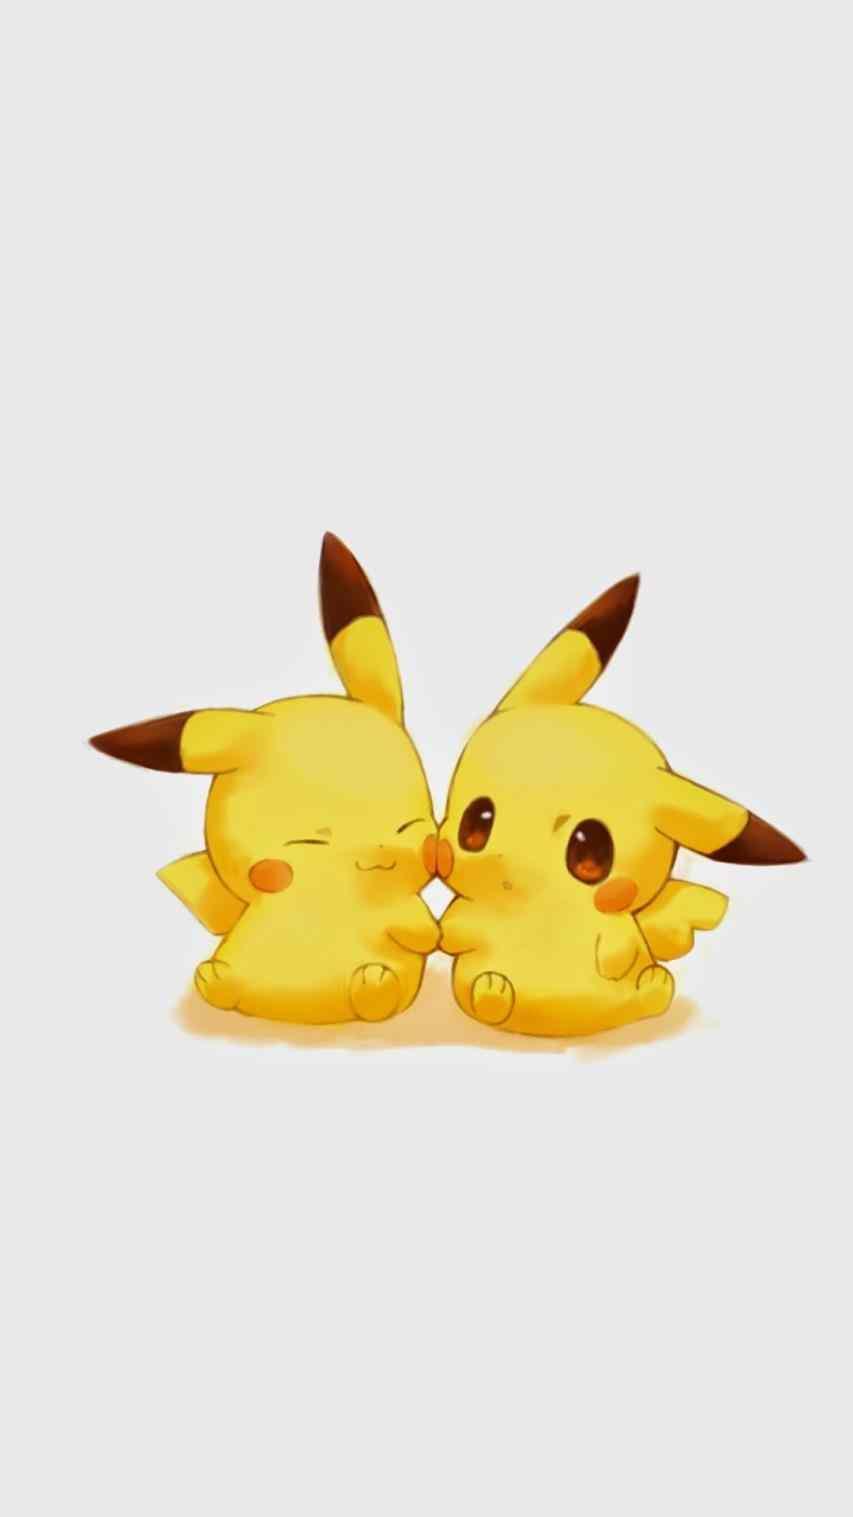 853x1517 Baby Pikachu Drawings Baby Pikachu Wallpapers Pc Baby Pikachu